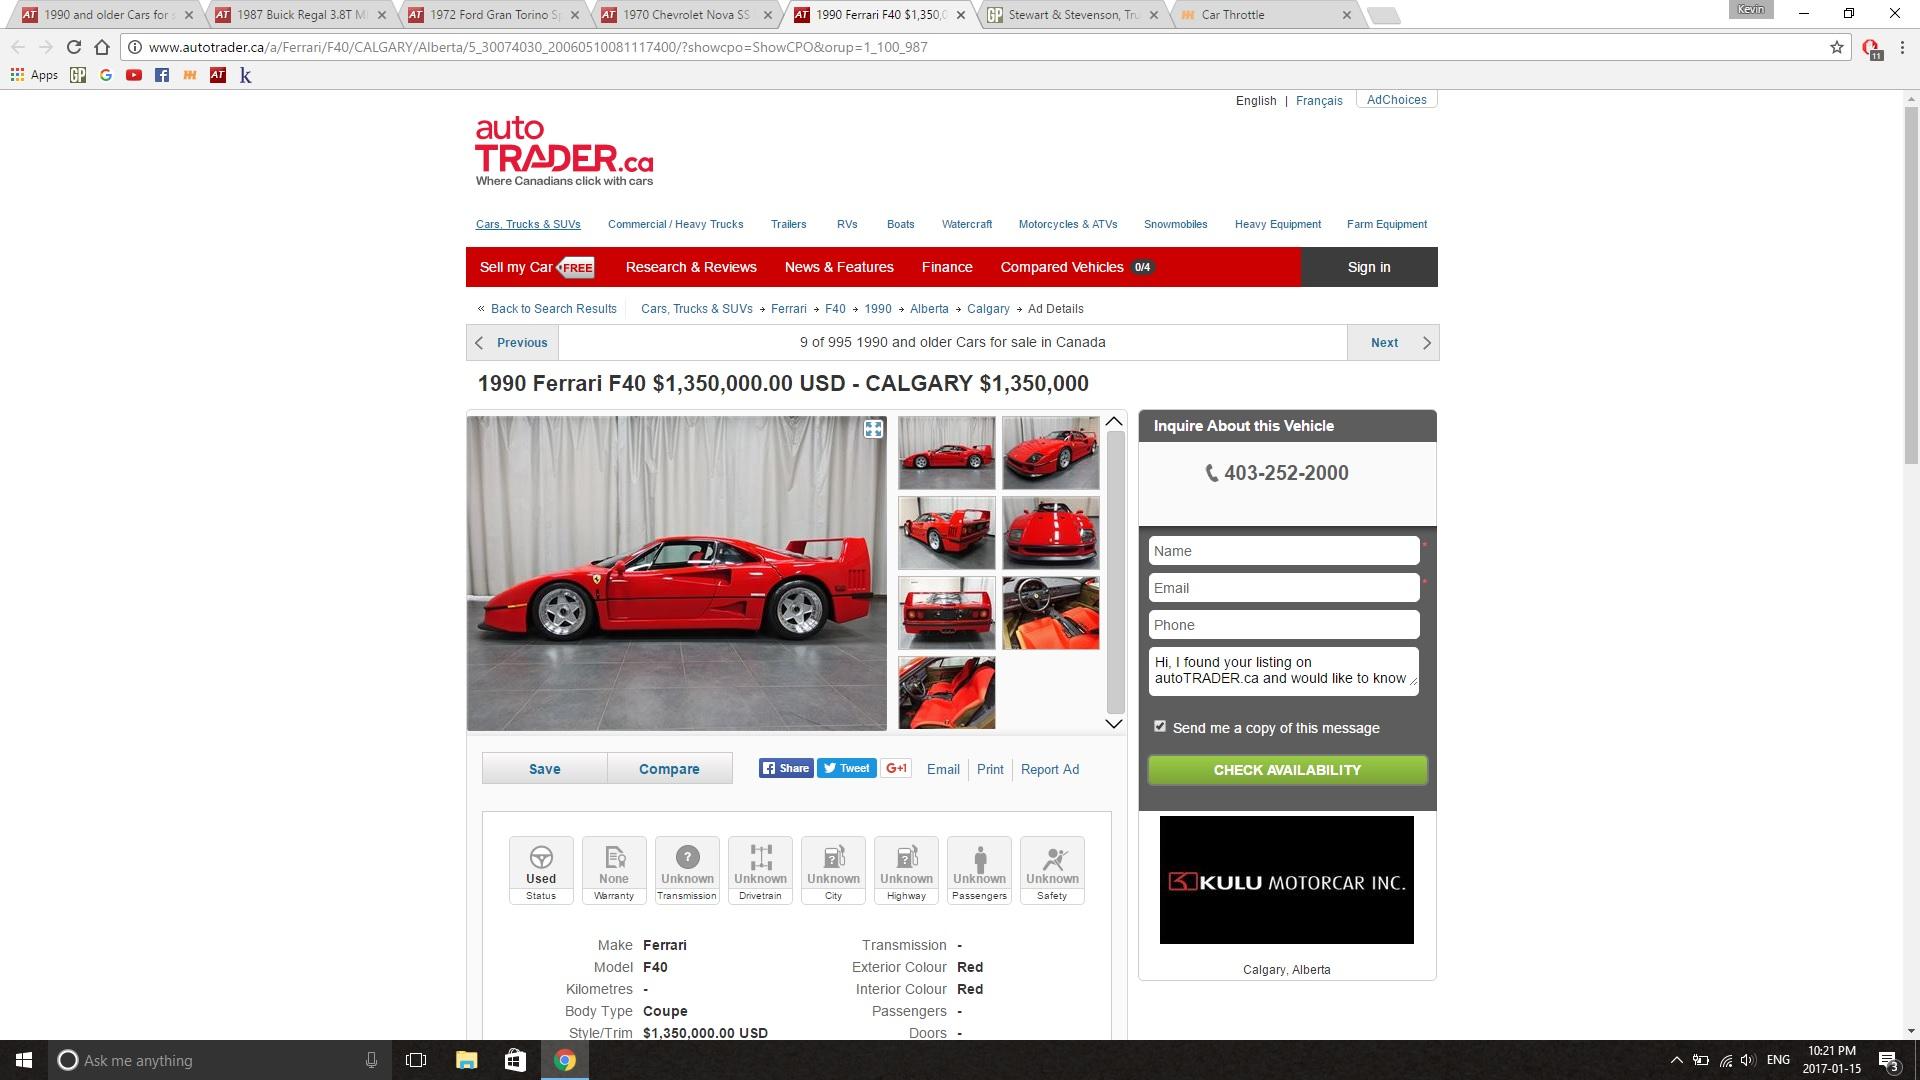 Luxury Www.autotrader.com Canada Gallery - Classic Cars Ideas - boiq ...